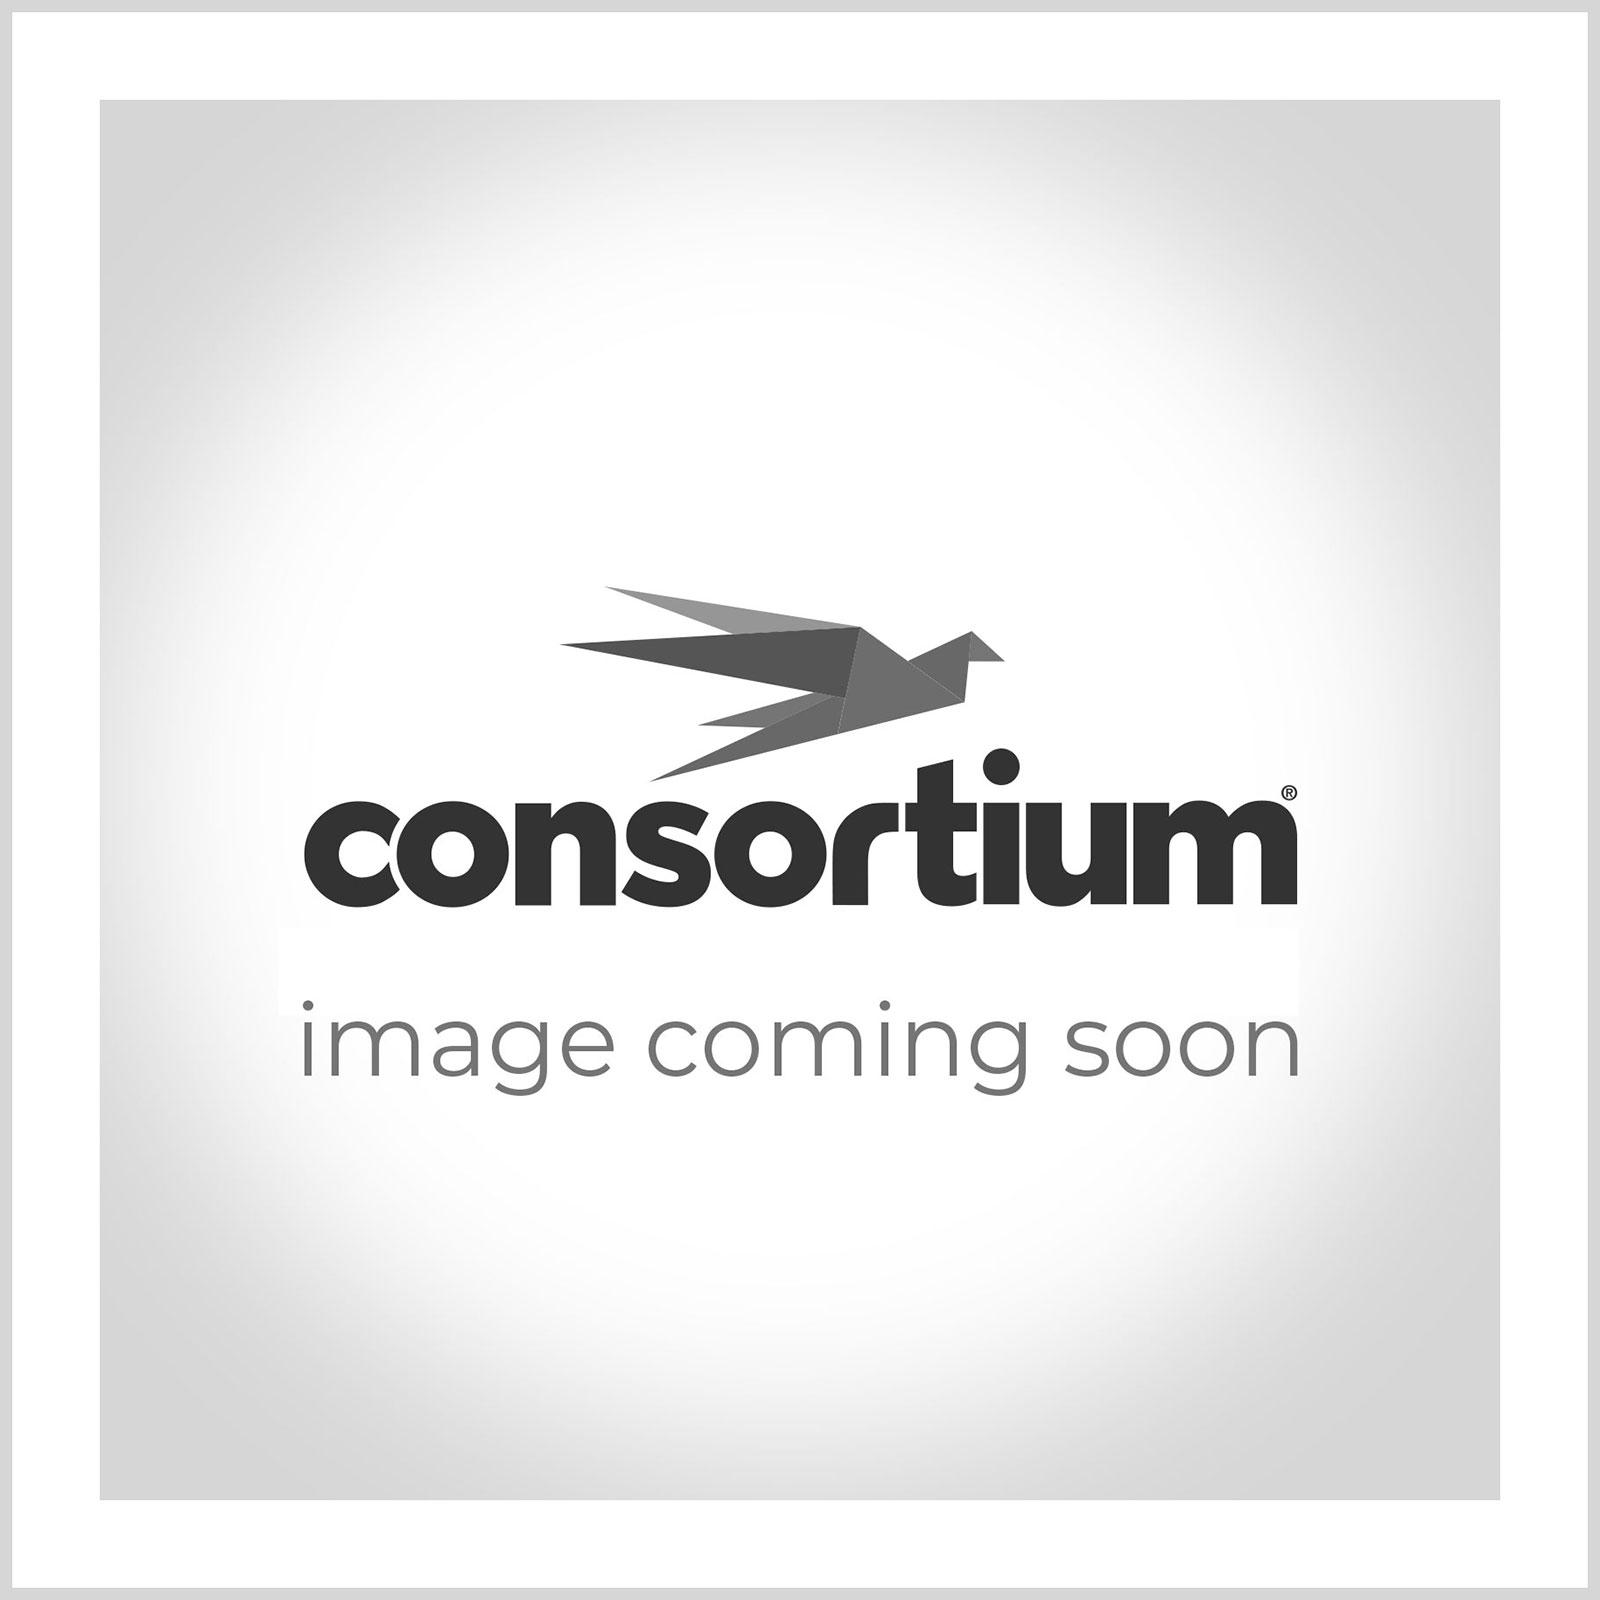 Carlton ISO 4.3 Badminton Racket